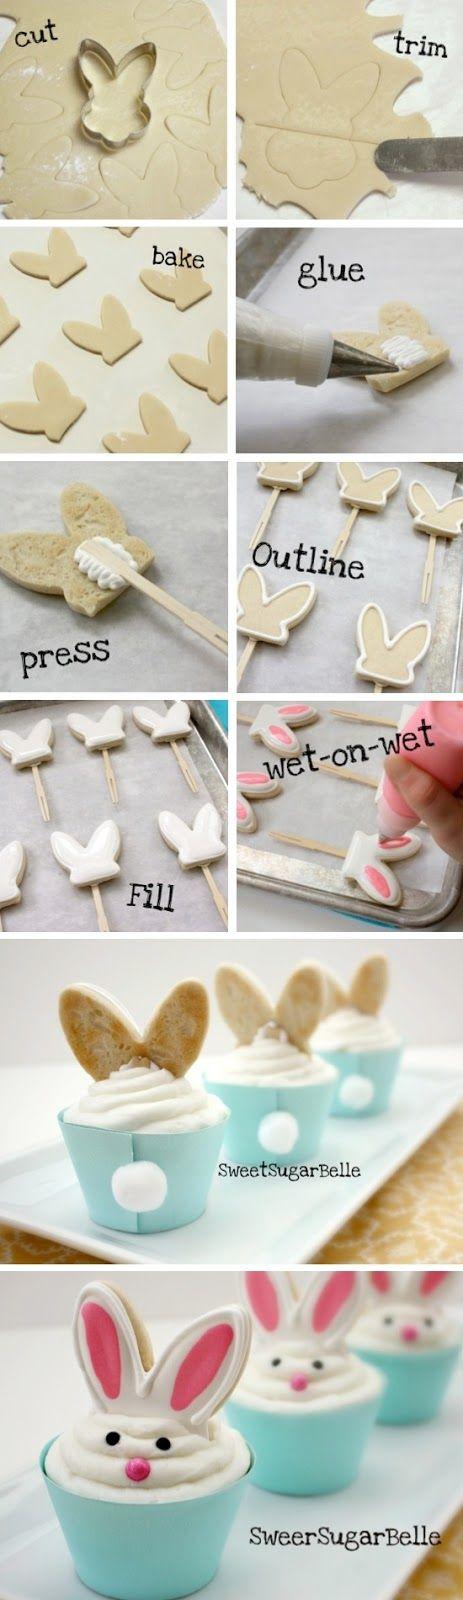 Easter-food idea-Bunny Ear Cupcakes Ideas para comida de Pascuas - Easter food ideas. We ♥ it PanamaFoodies.com